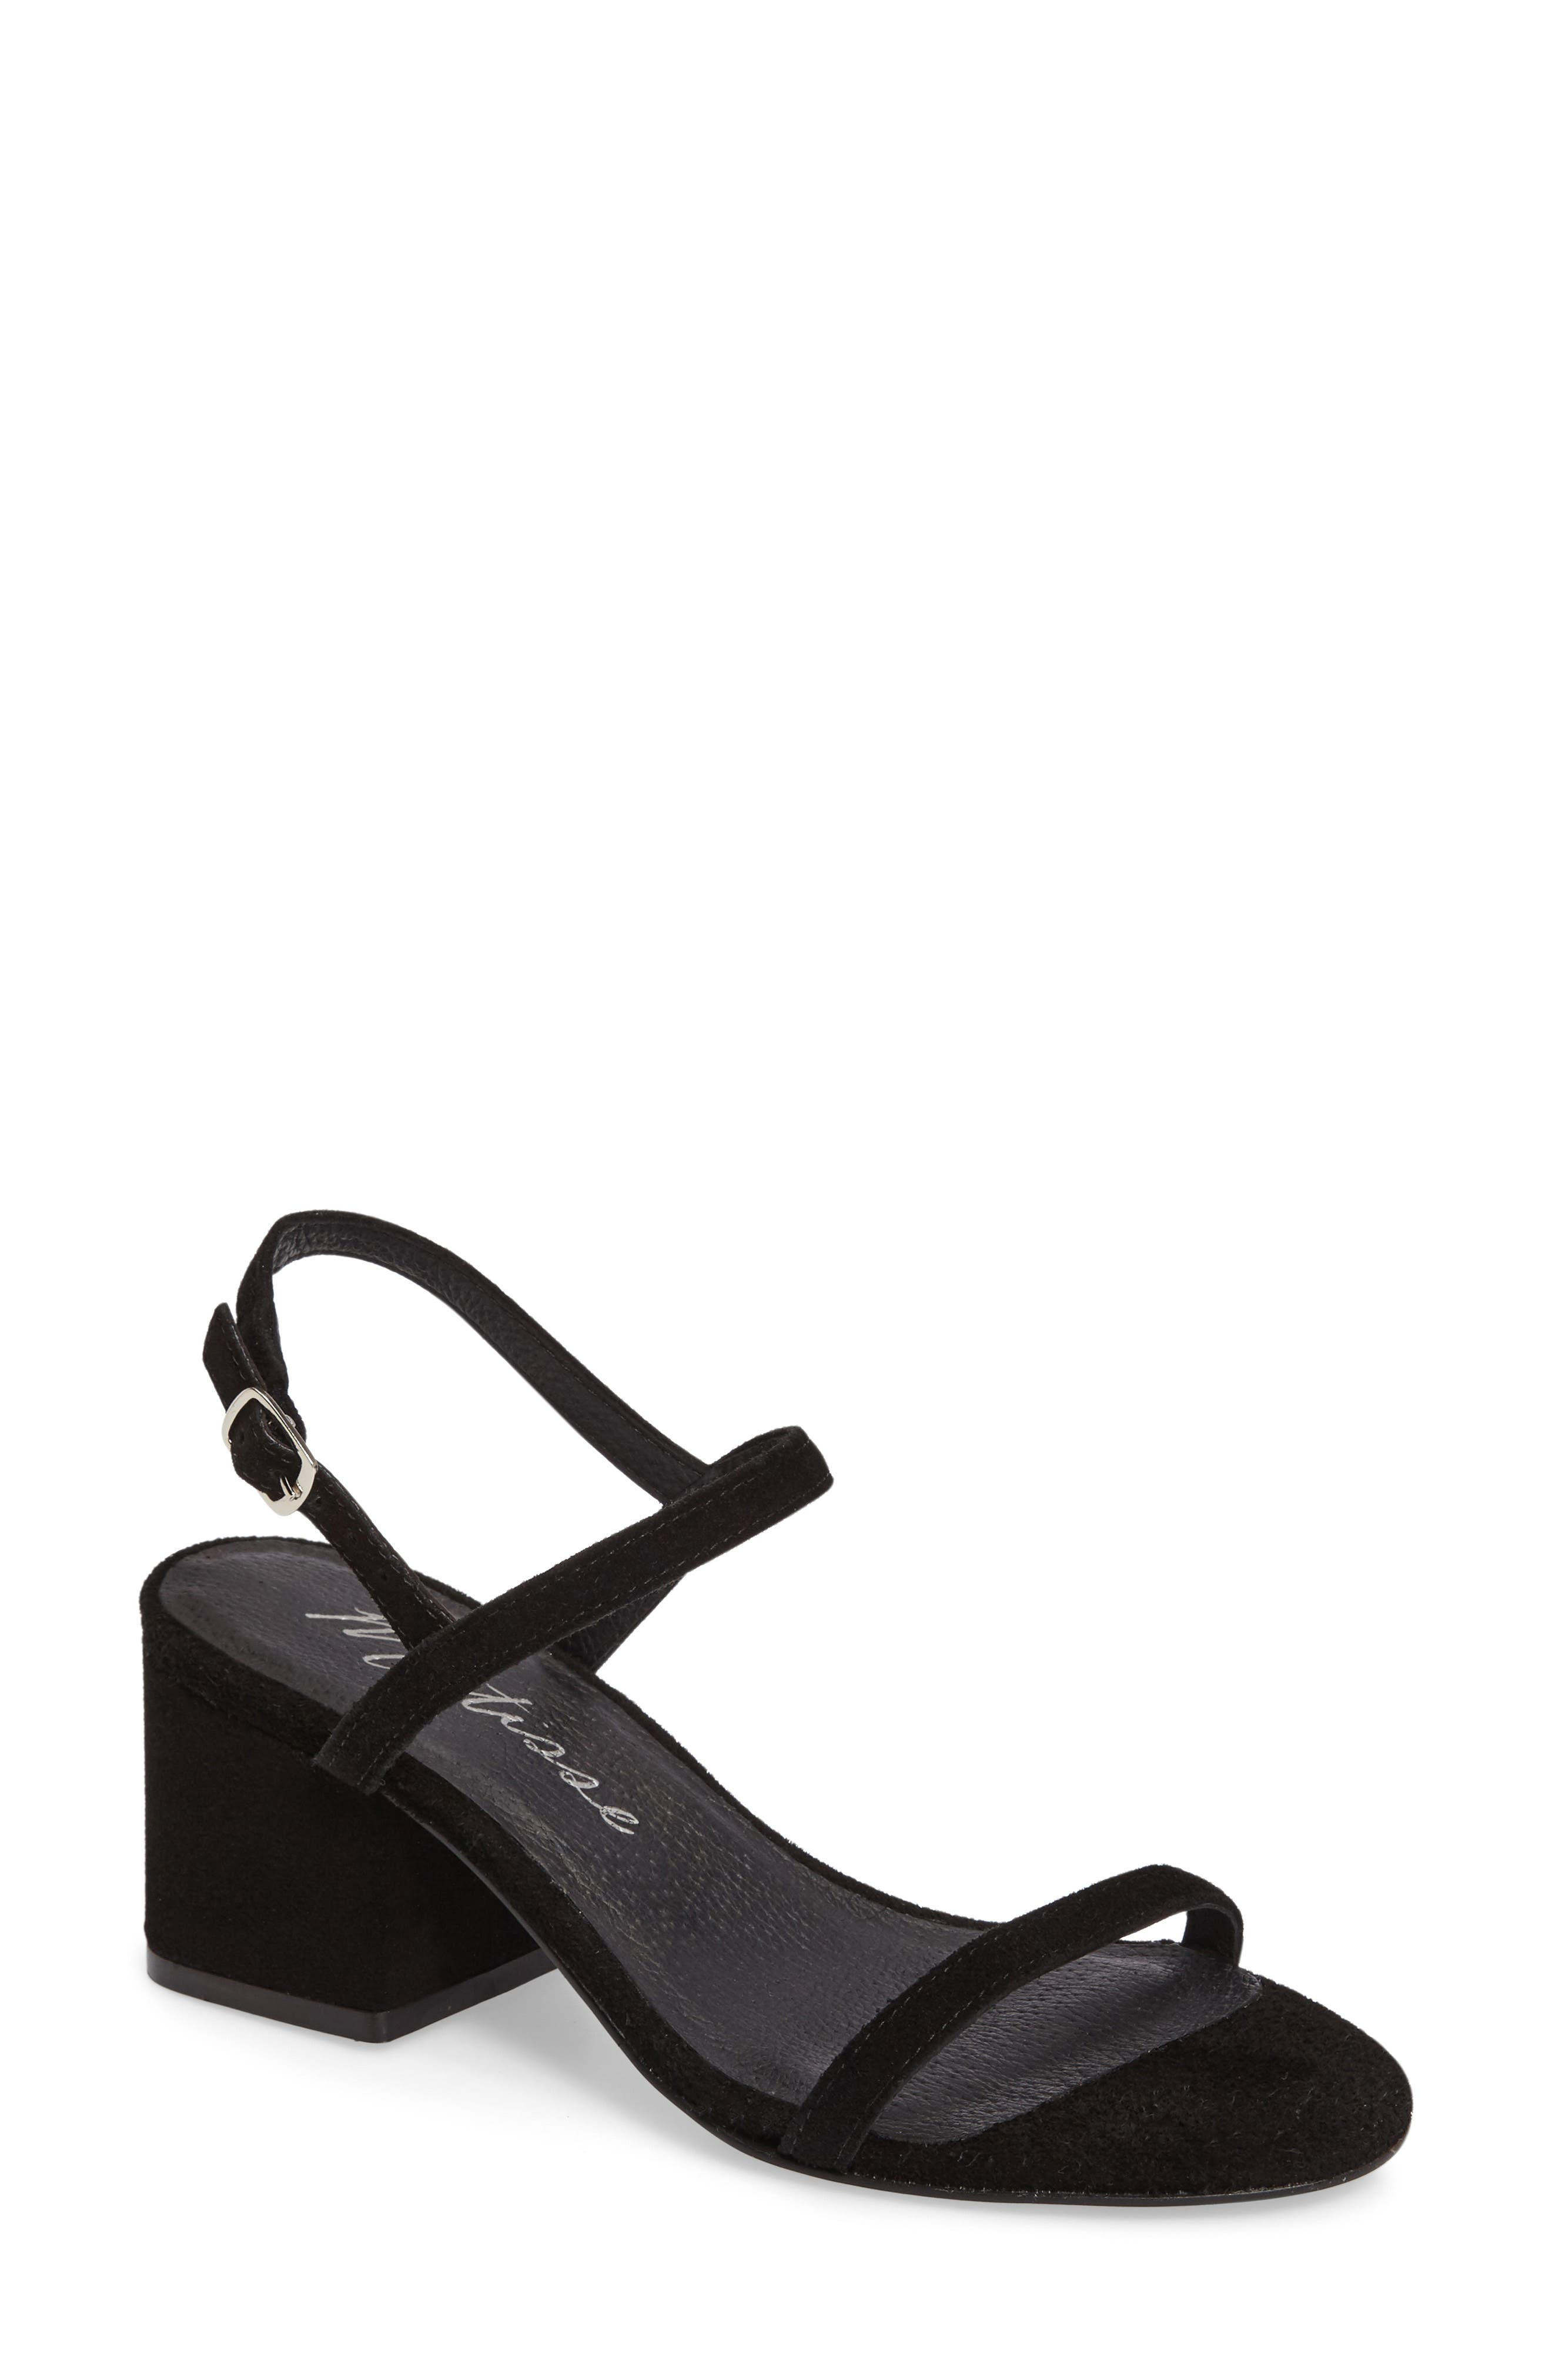 Main Image - Matisse Stella Block Heel Sandal (Women)